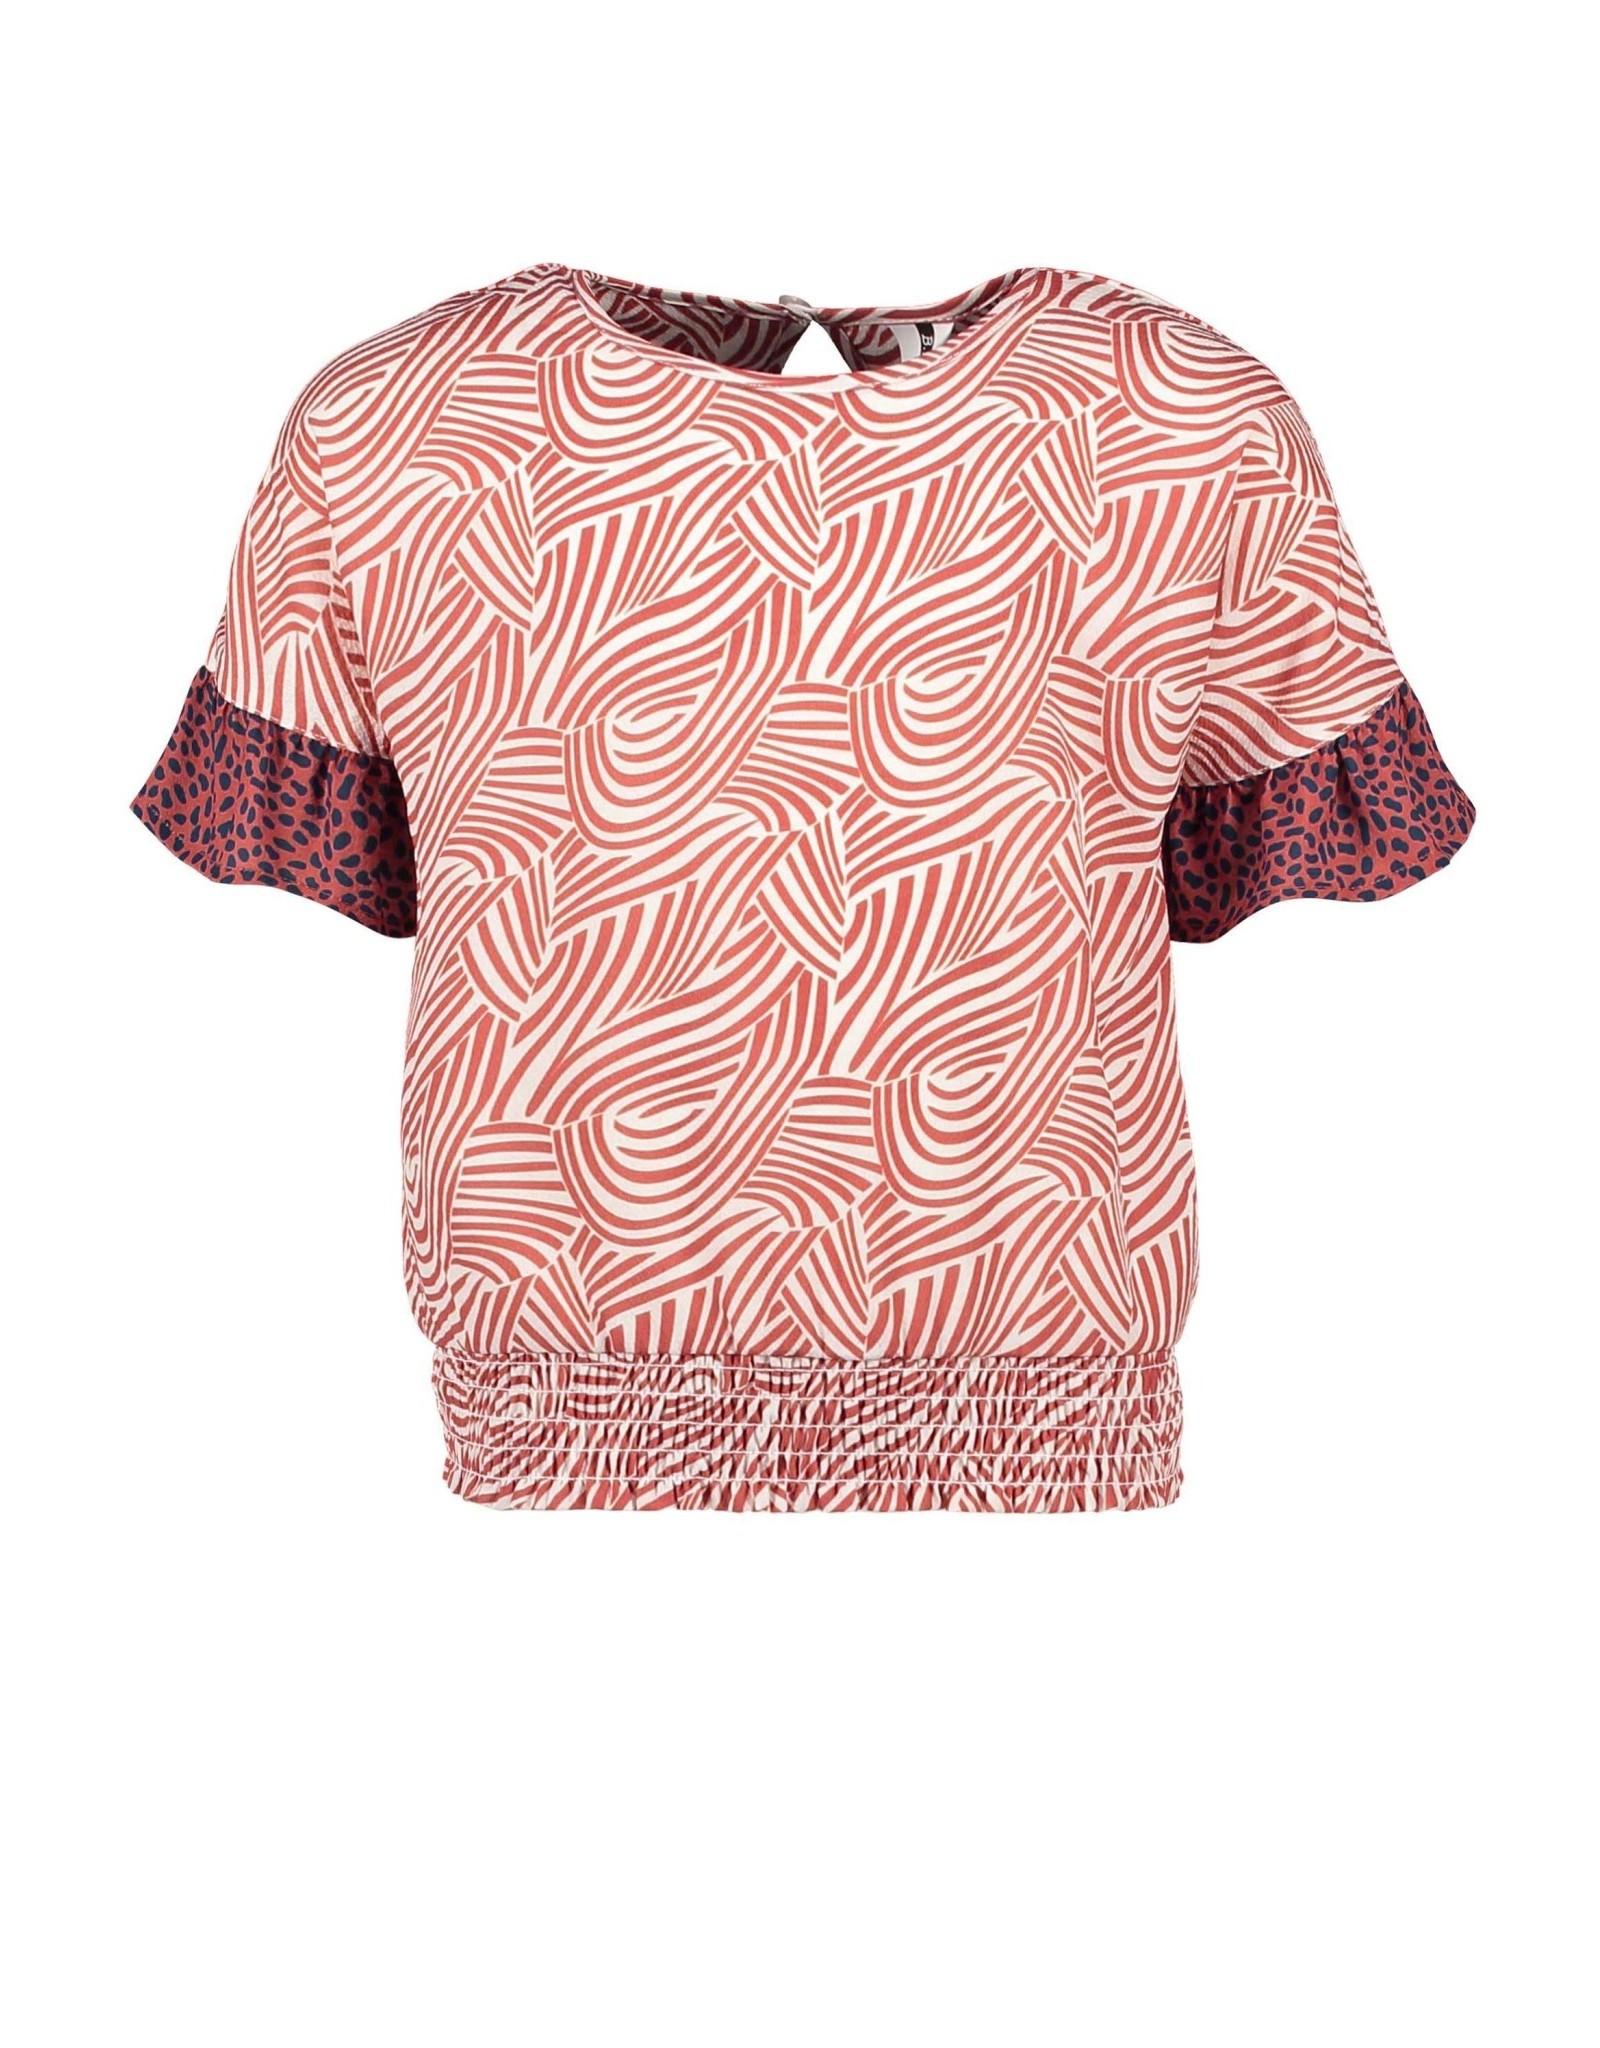 B.Nosy B.Nosy meisjes t-shirt met trompetmouwtjes Mix Zebra